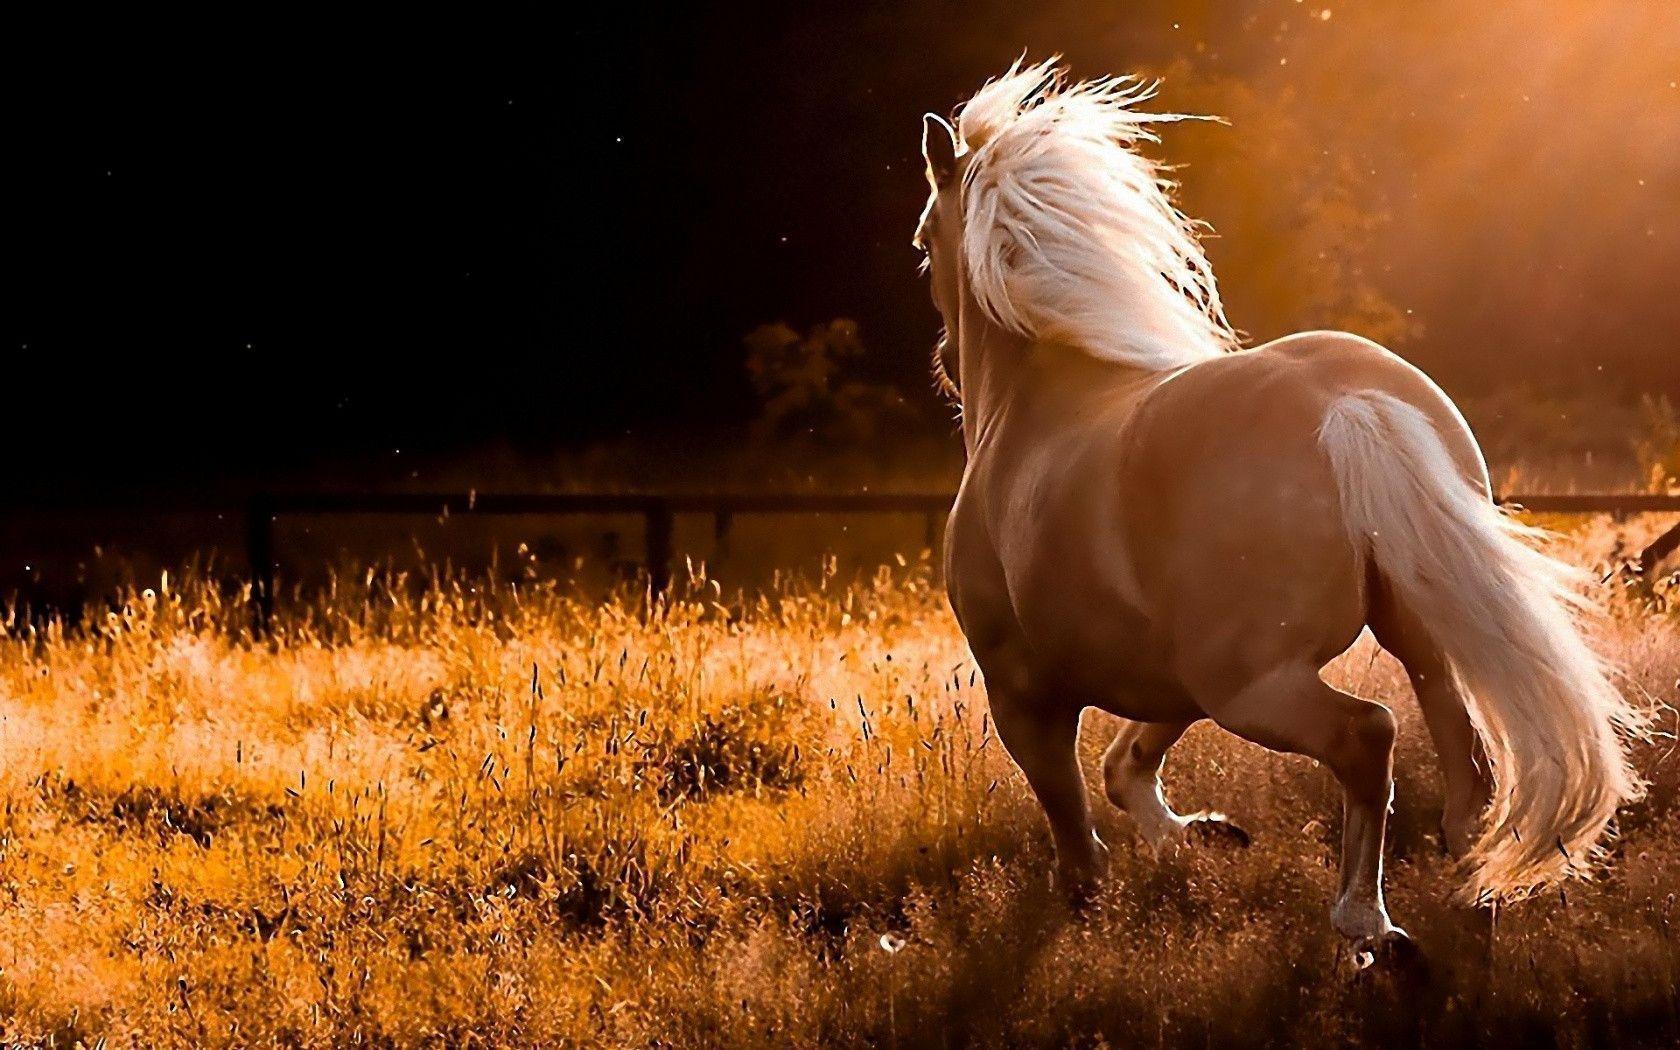 Wild Horses Wallpapers   Top Wild Horses Backgrounds 1680x1050